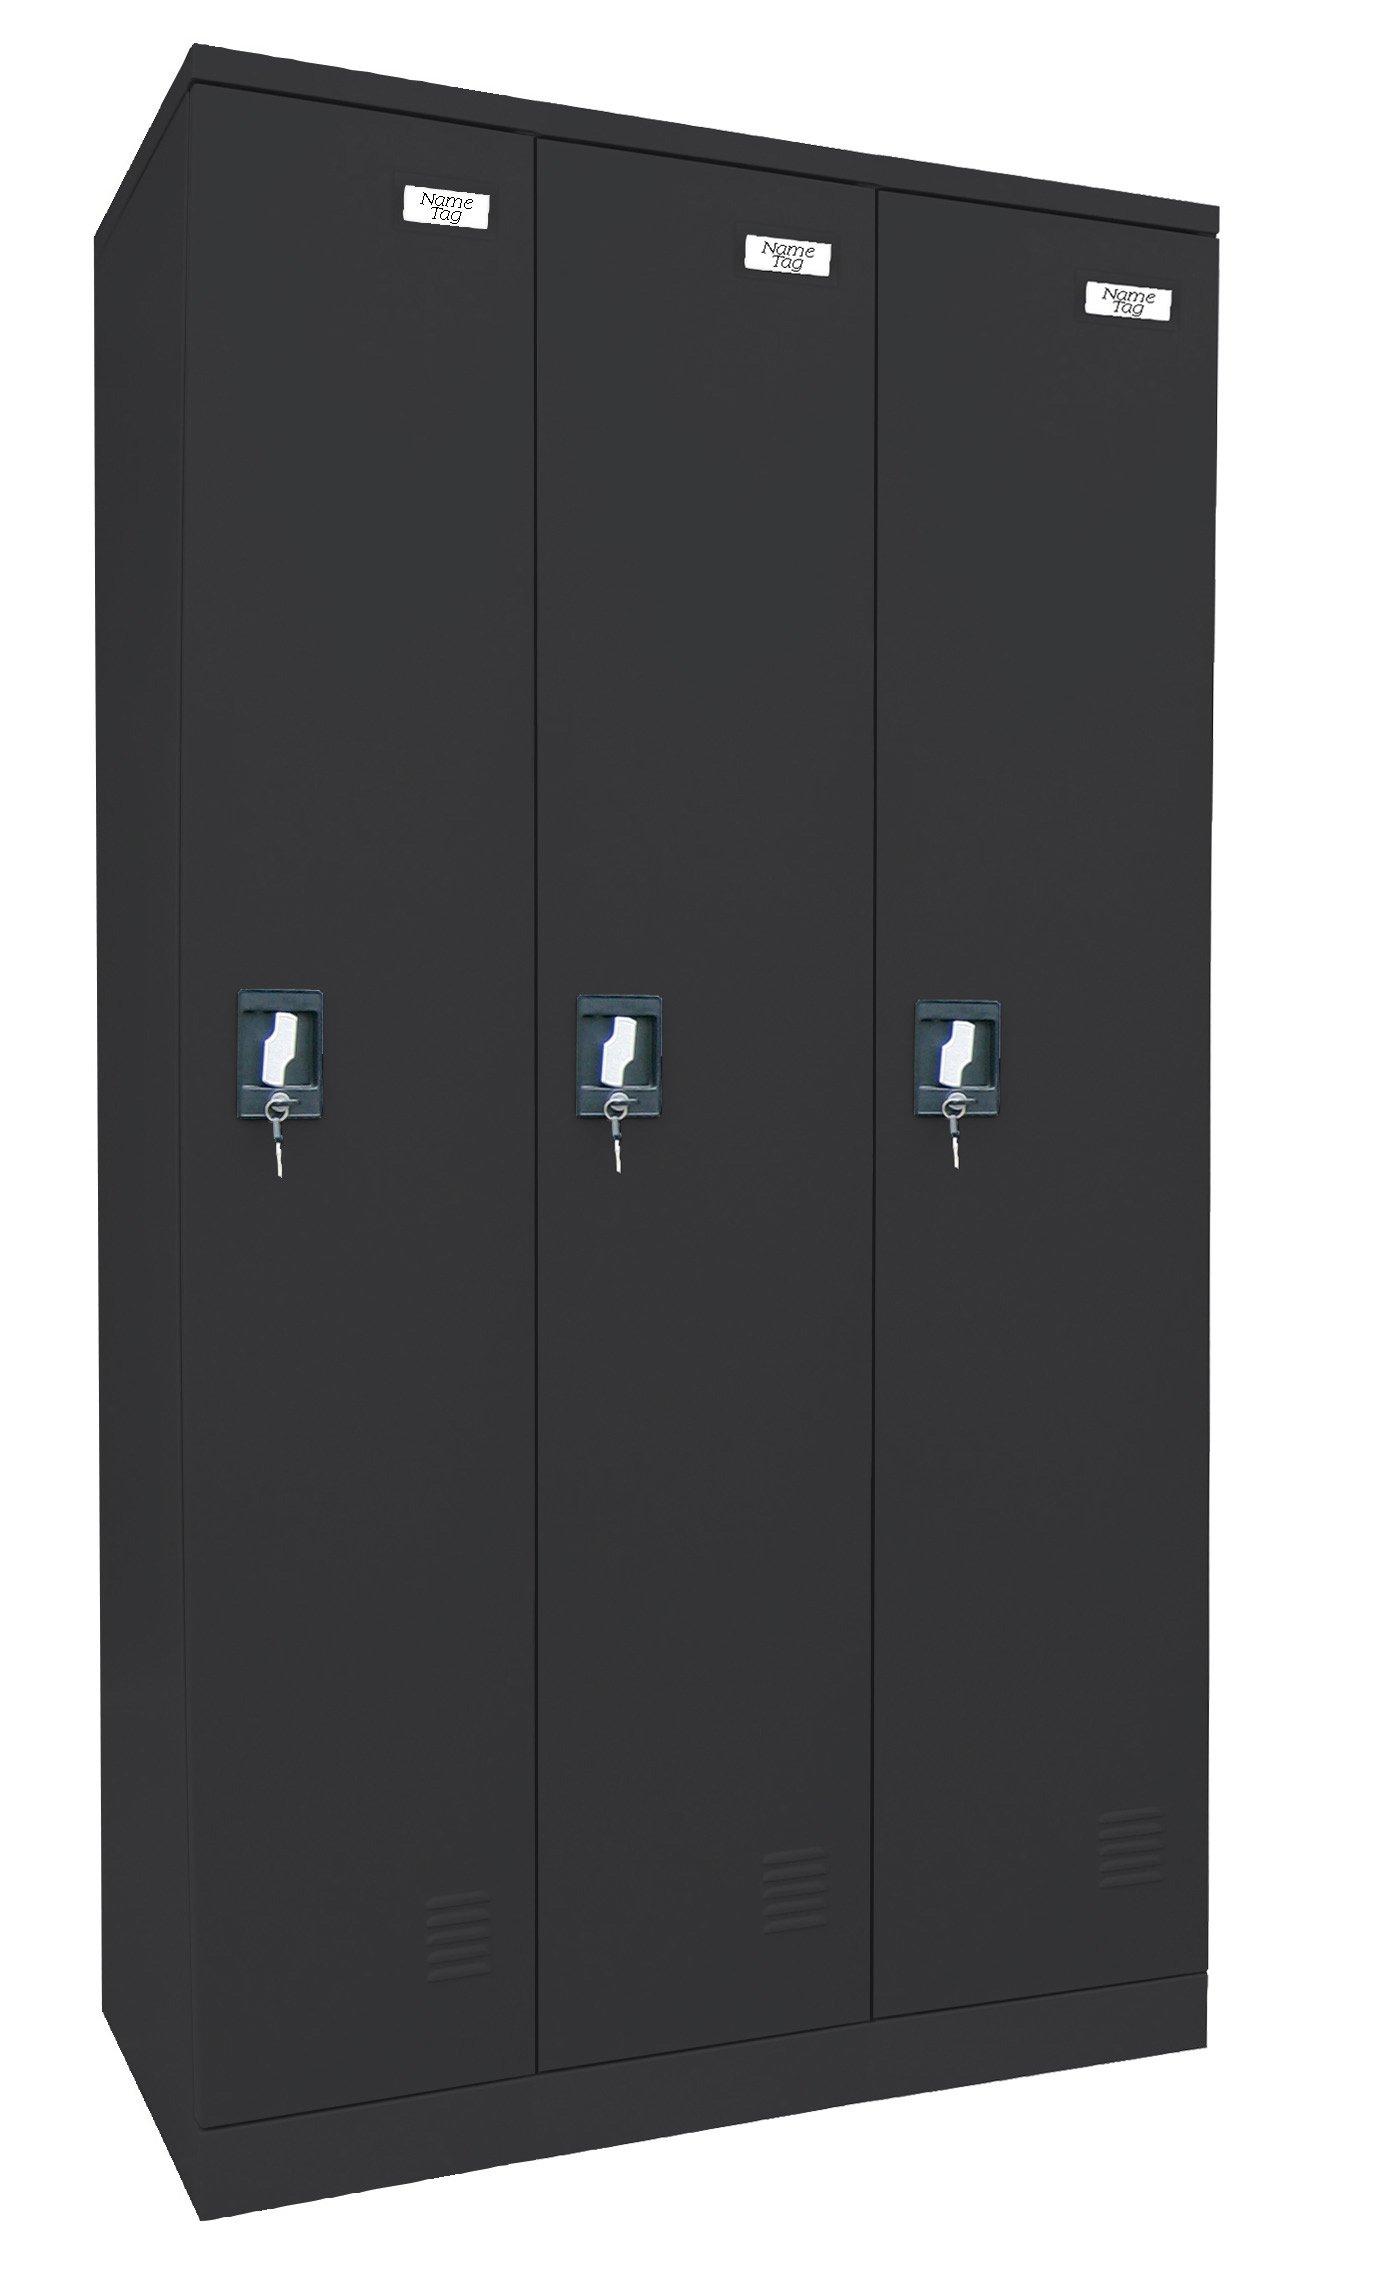 Sandusky Lee KDCL7236/3-09 Black Powder Coat Paint Steel SnapIt Full Length Locker, 72'' Height x 36'' Width x 18'' Depth, 3 Shelves